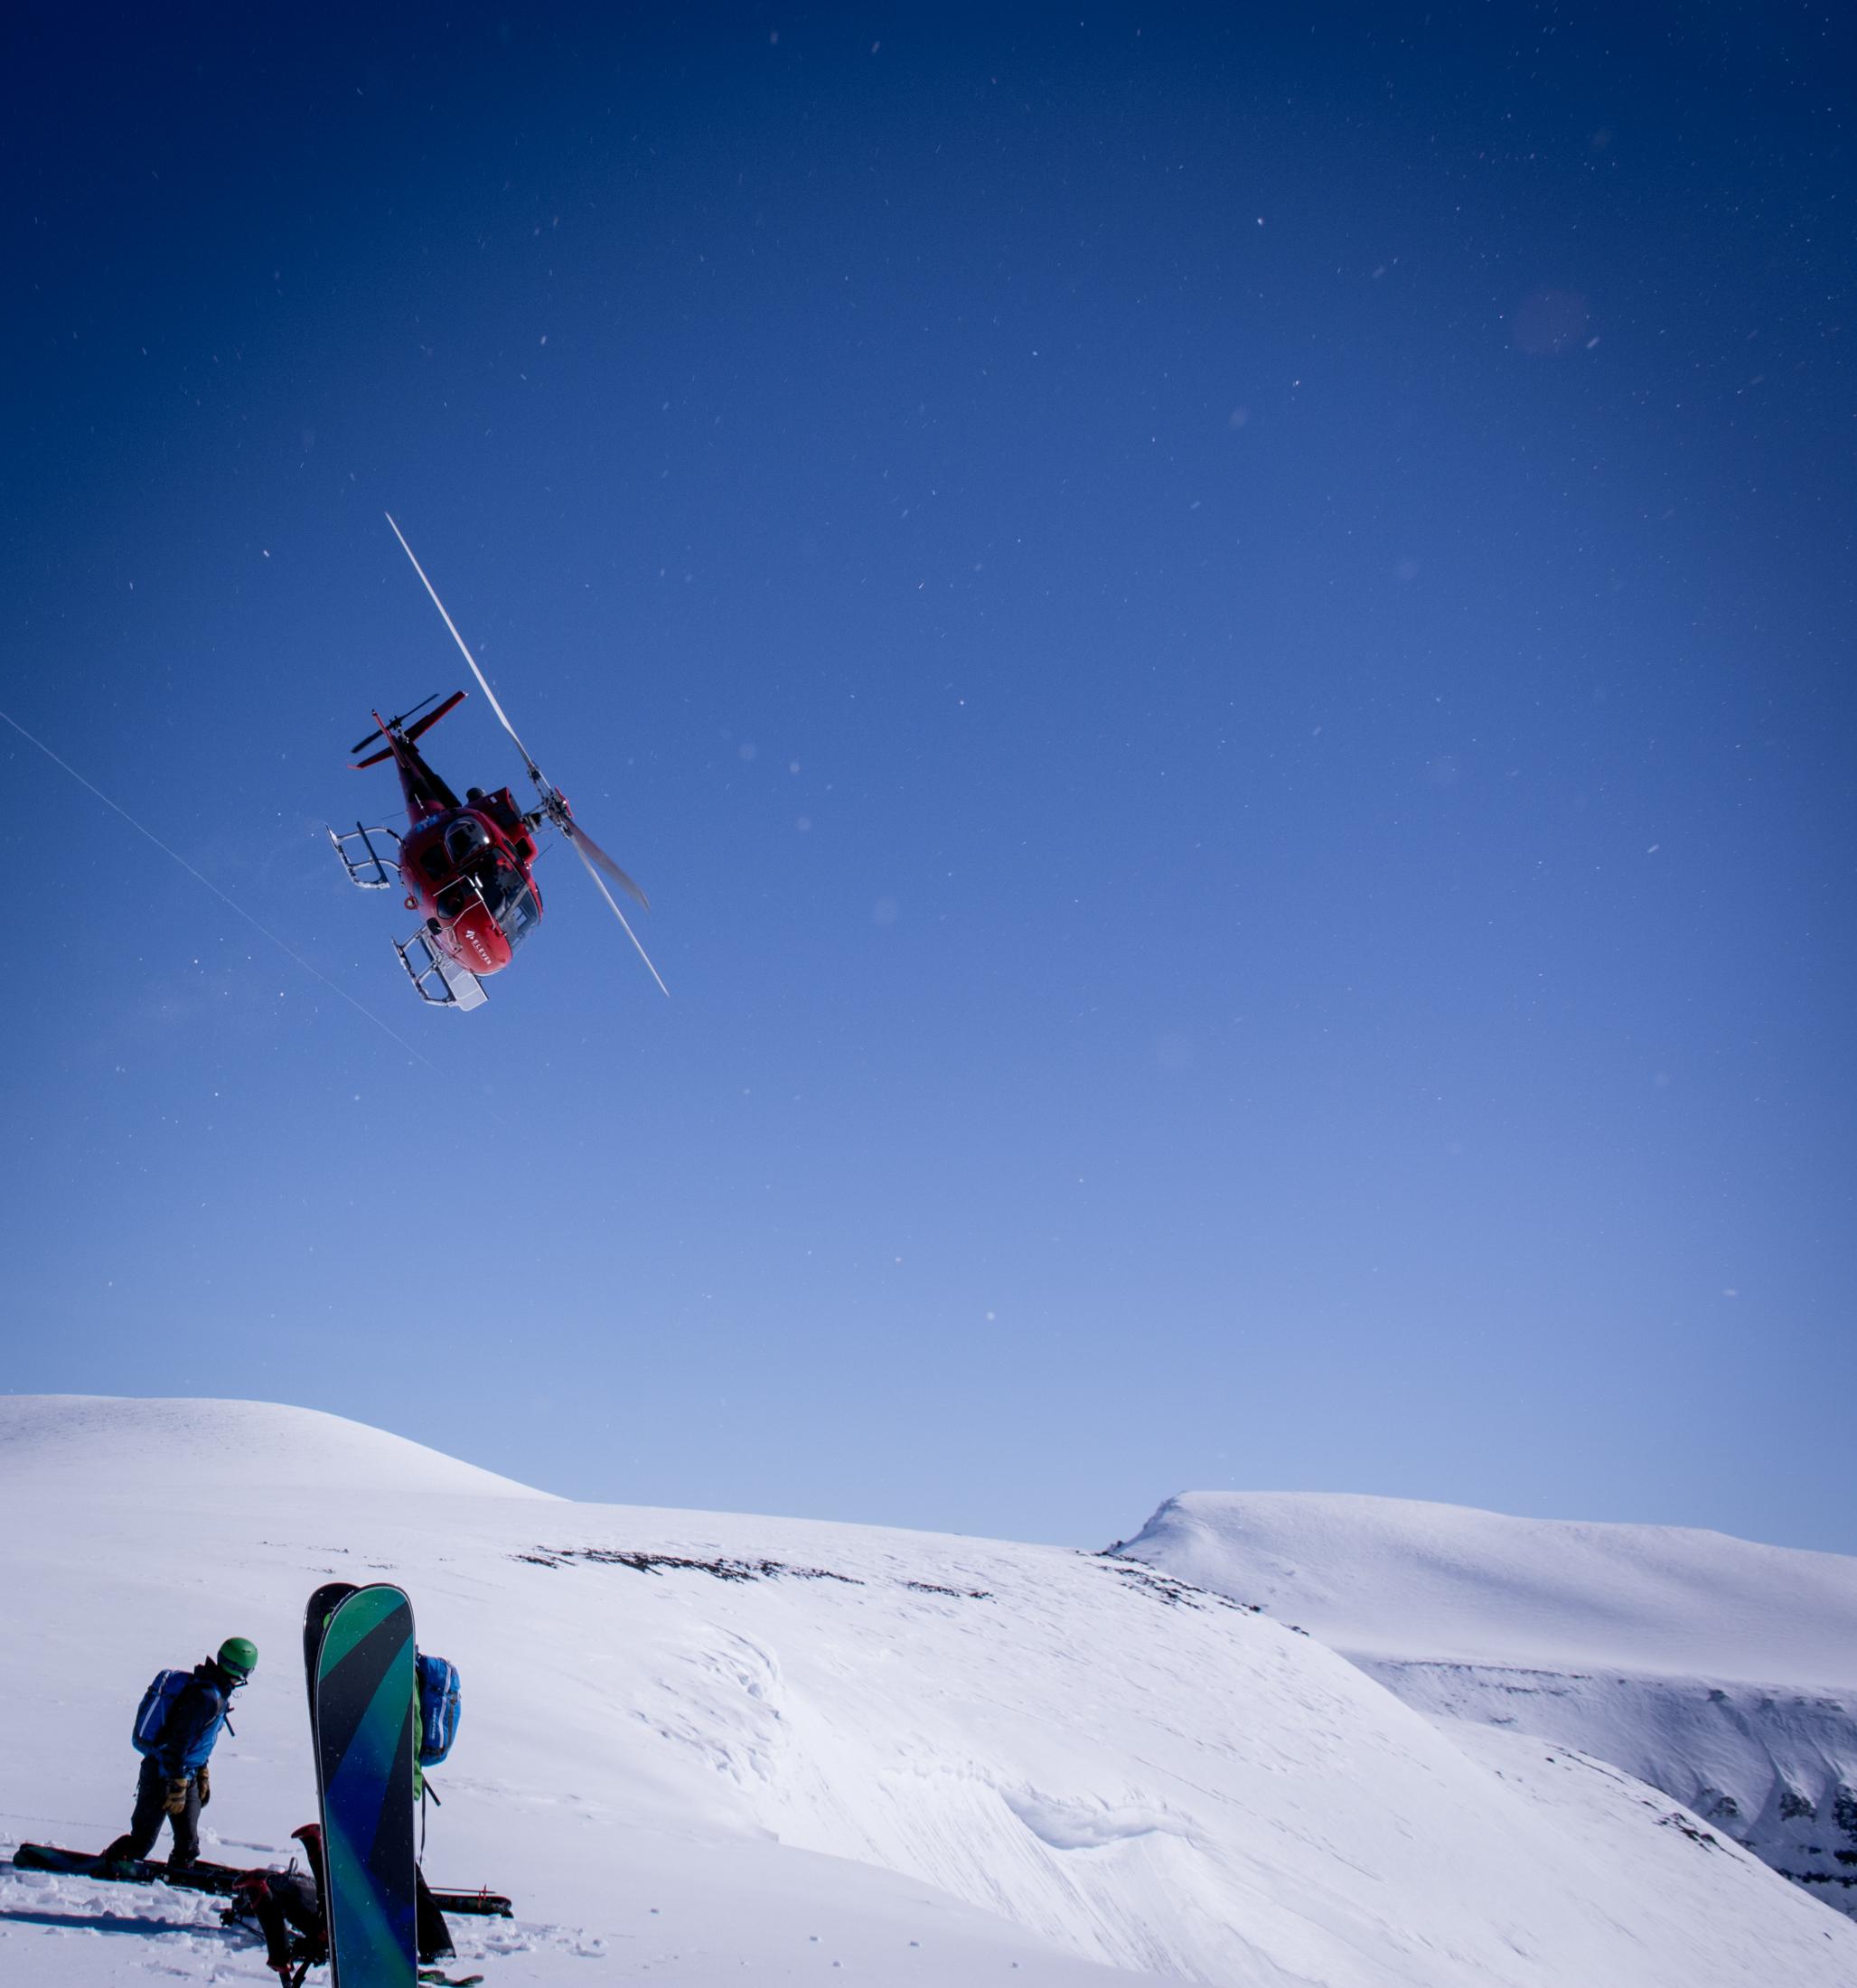 Private Clubs: Heli-Skiing Iceland's Troll Peninsula